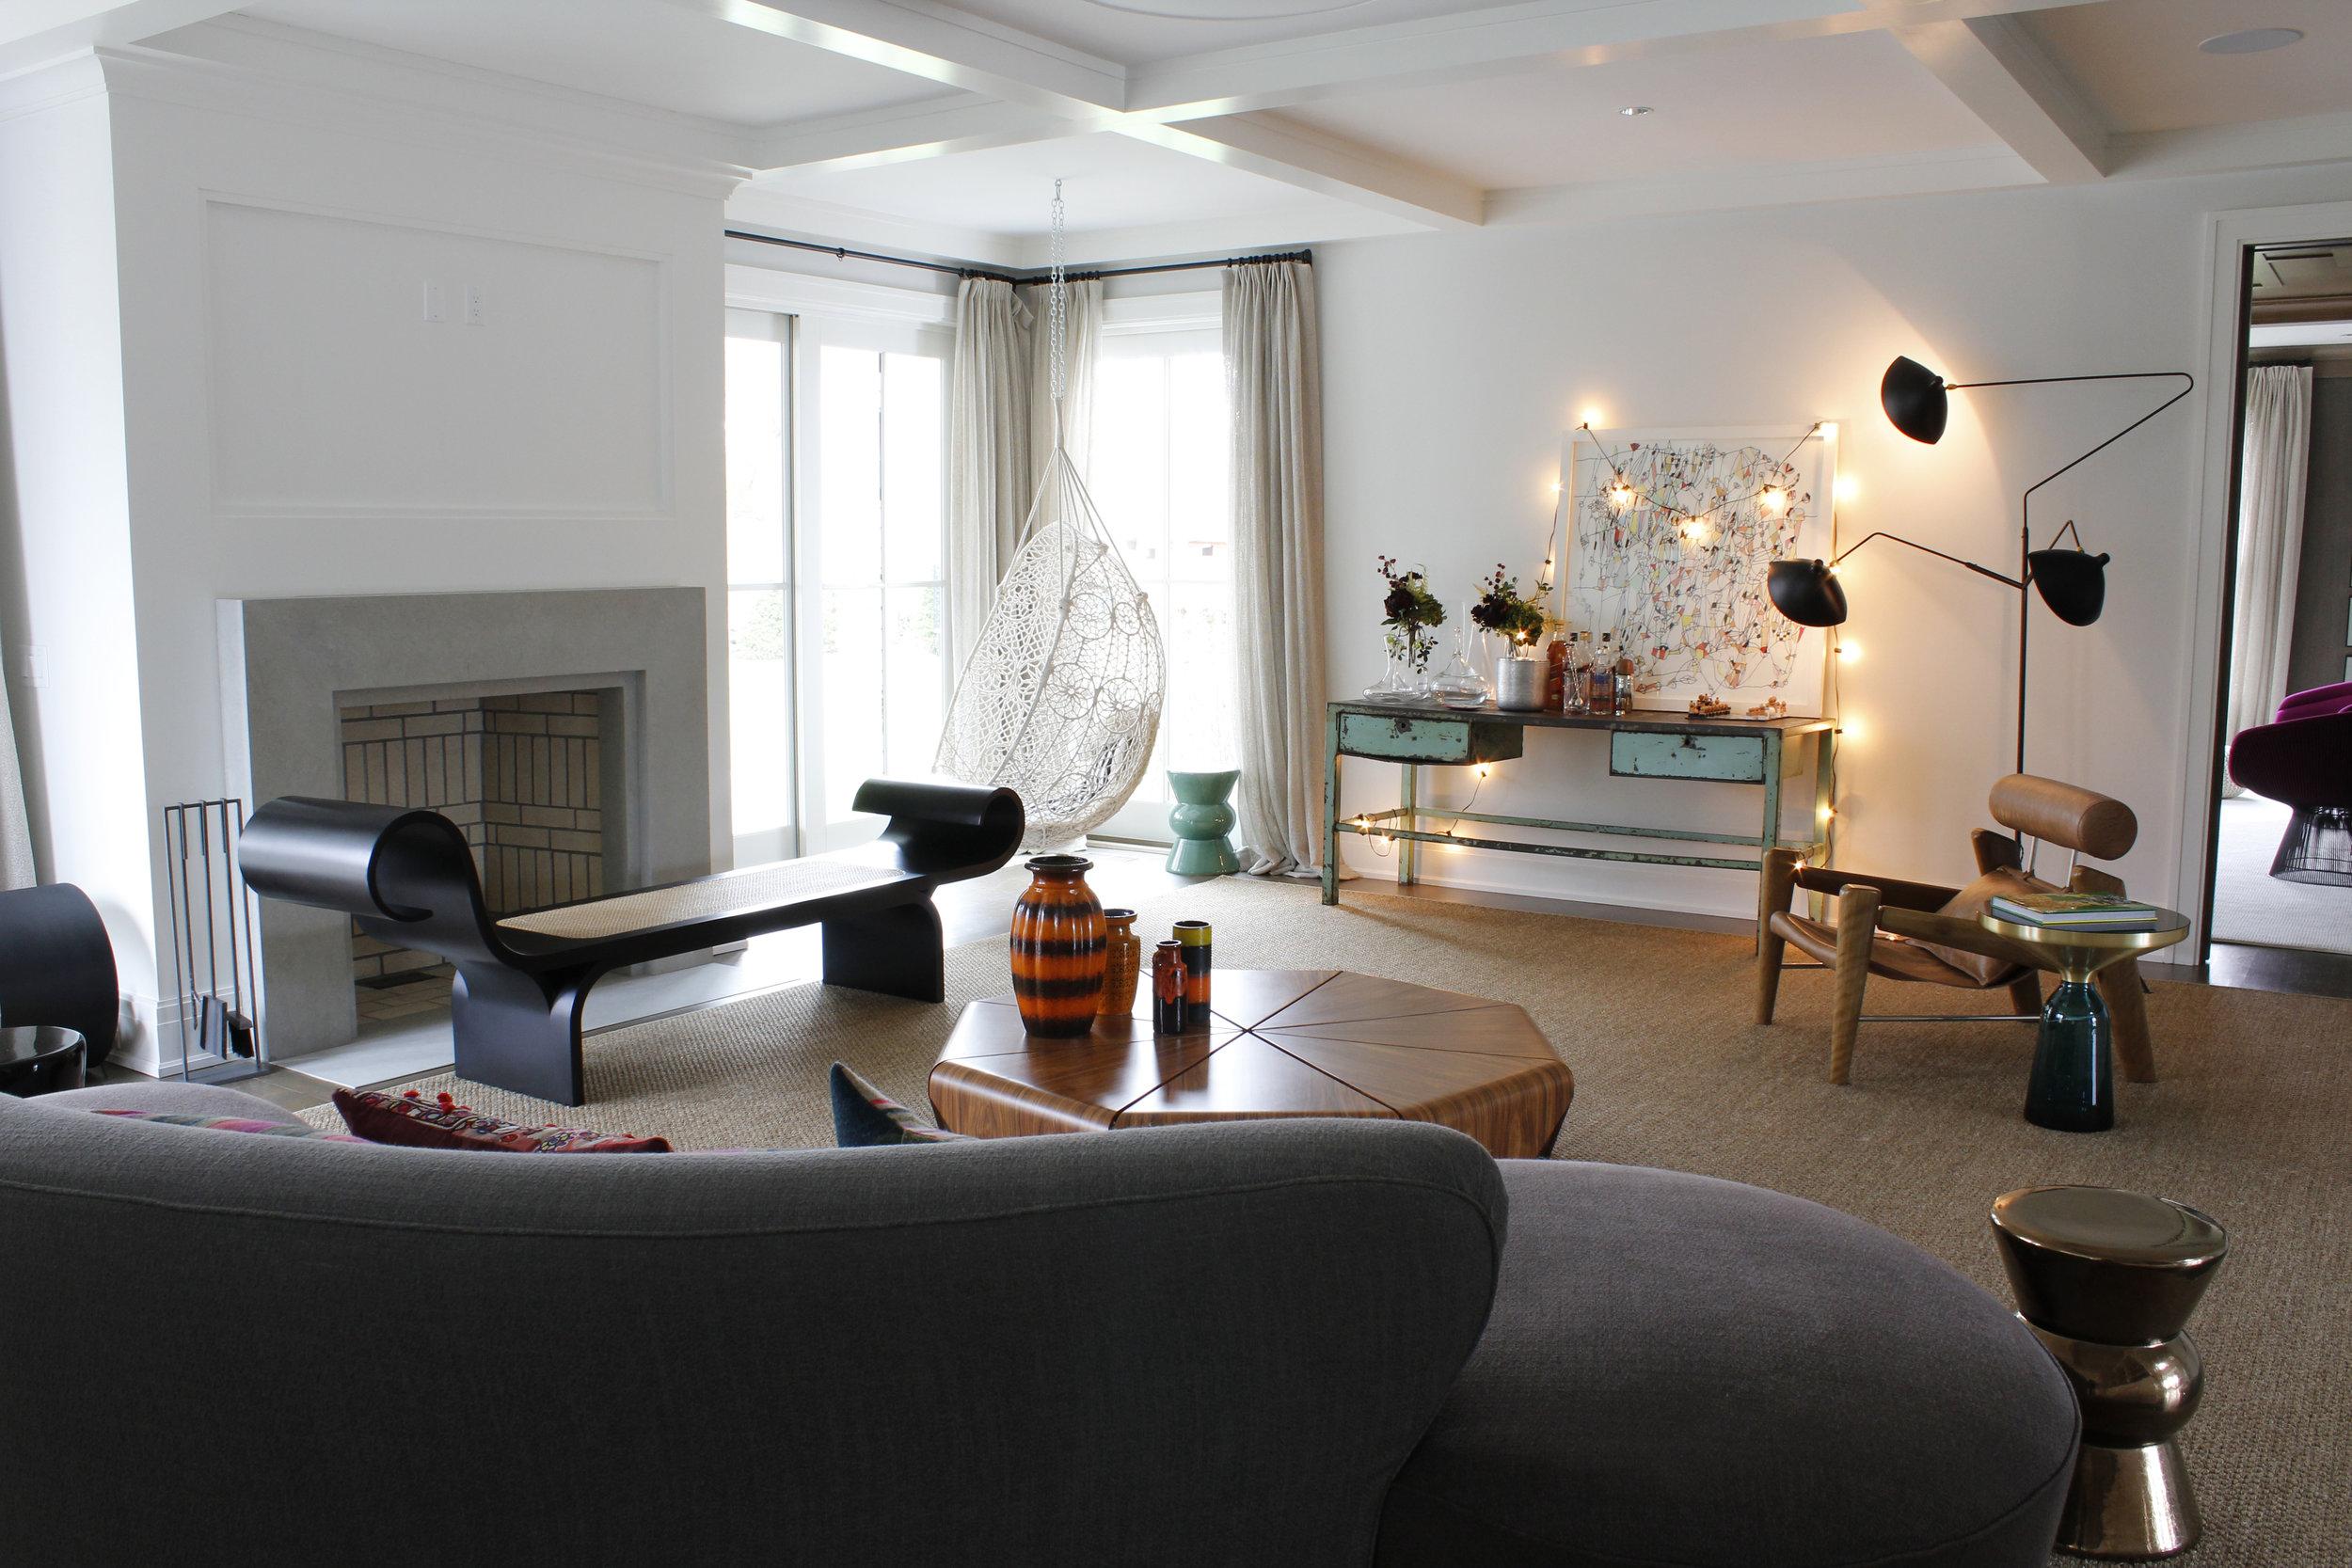 Nana Cunha - 4 Living room b.jpg